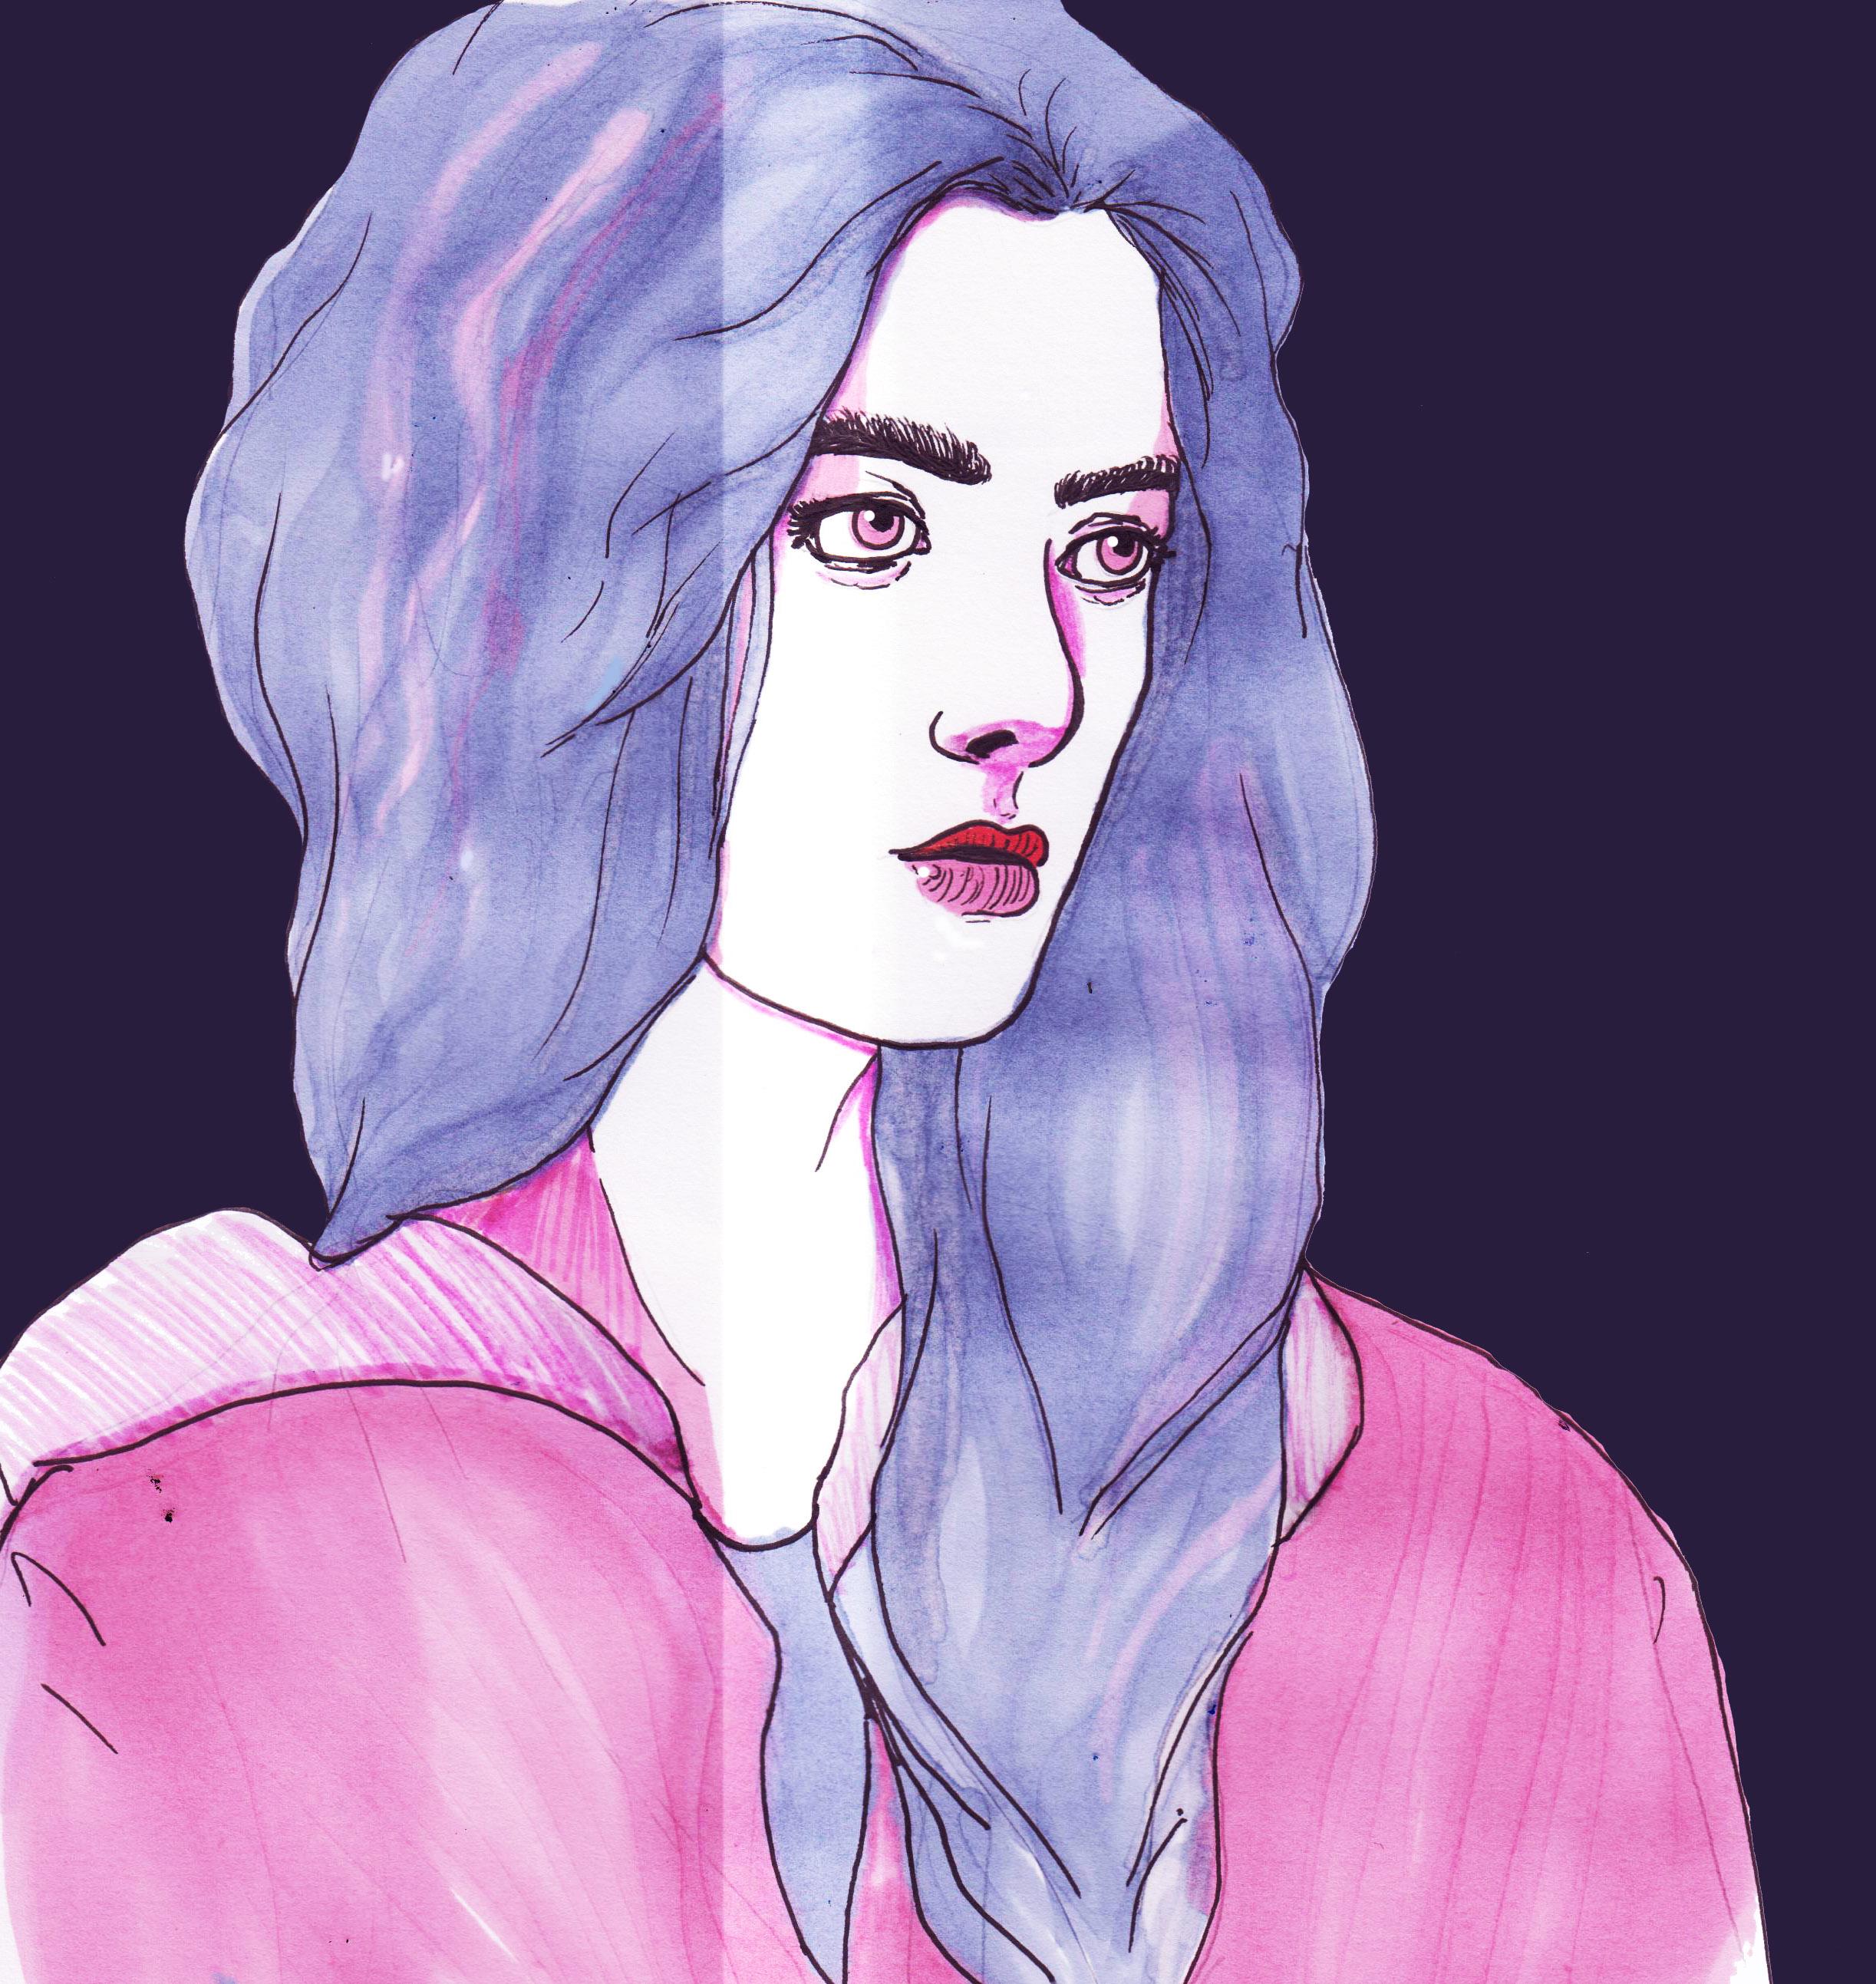 broken youth purple haired girl edit 3 copy.jpg